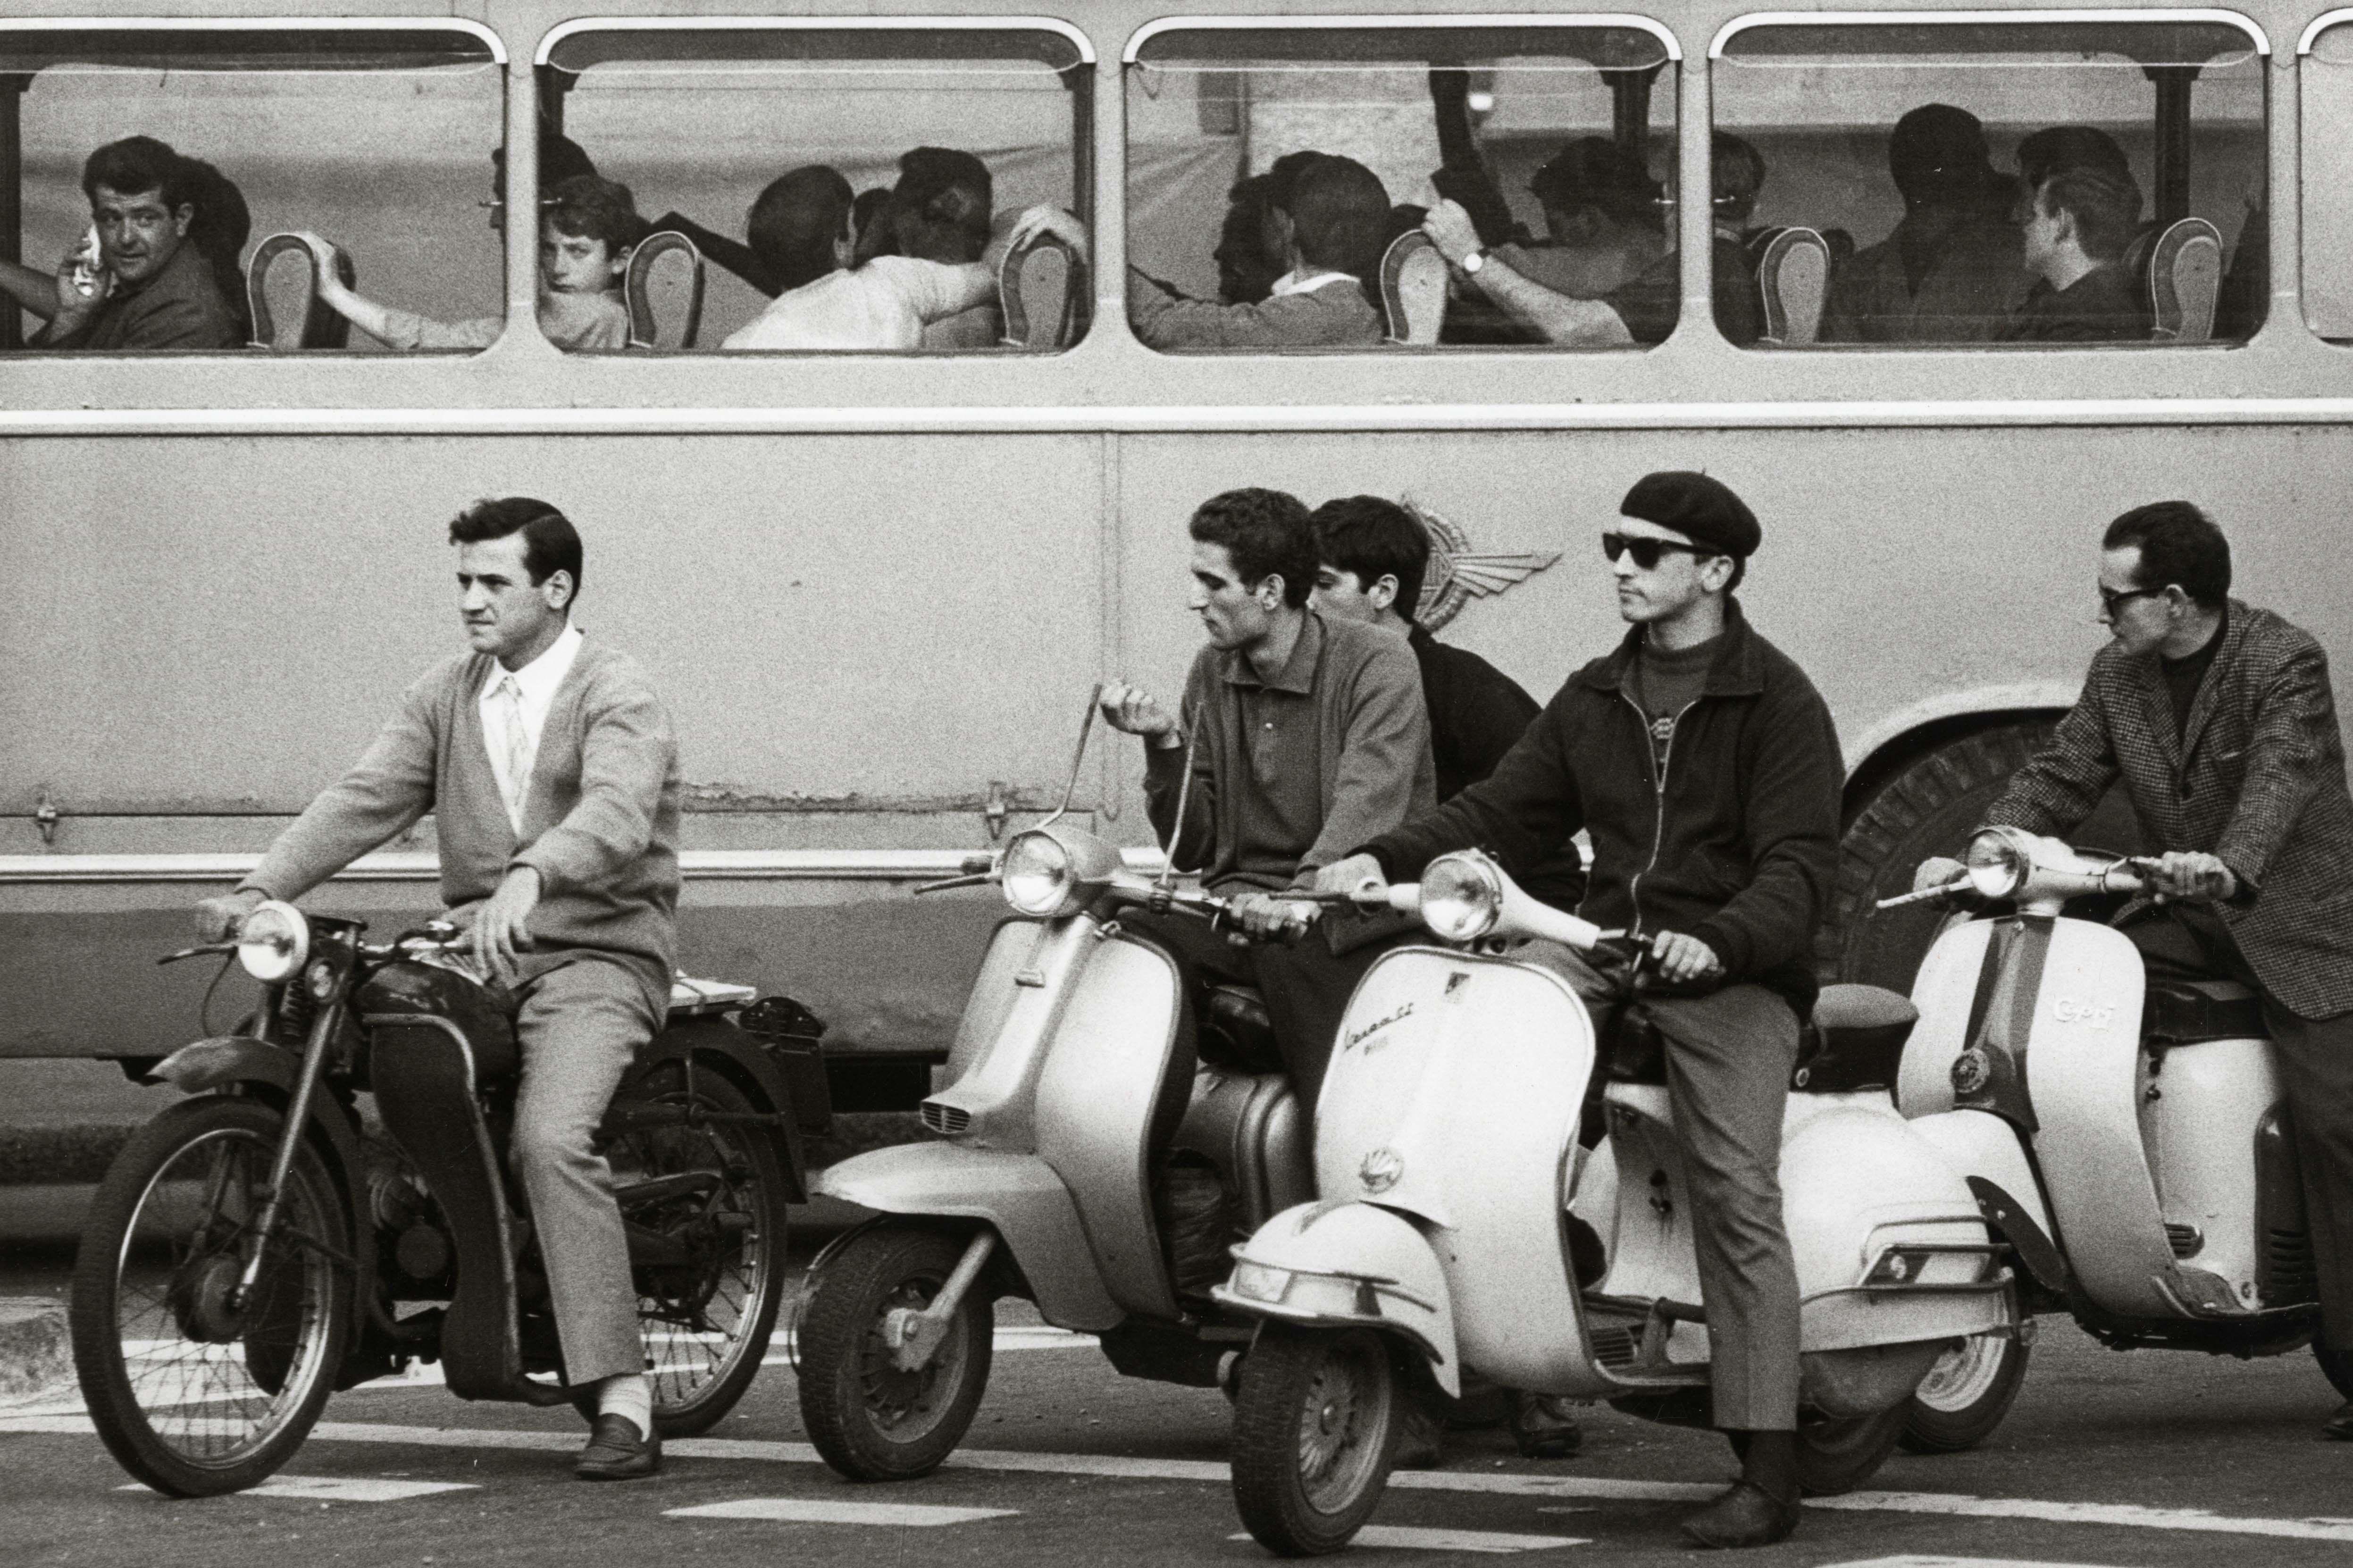 Toni Nicolini, Sesto San Giovanni, 1966